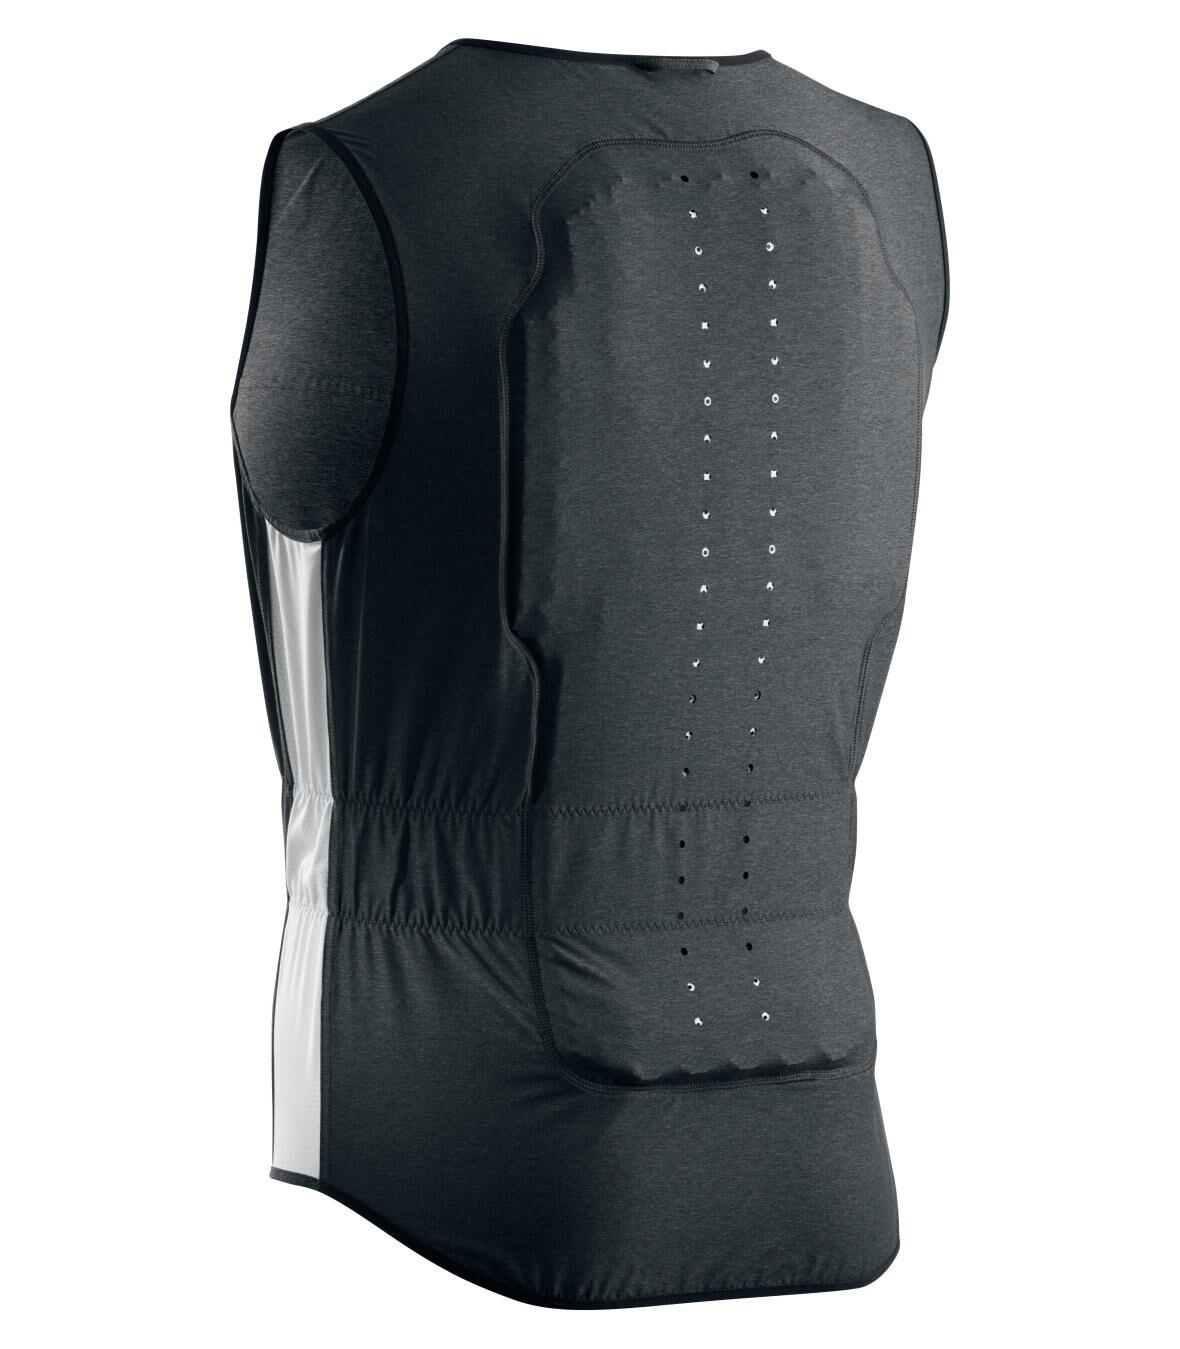 Decathlon back protection